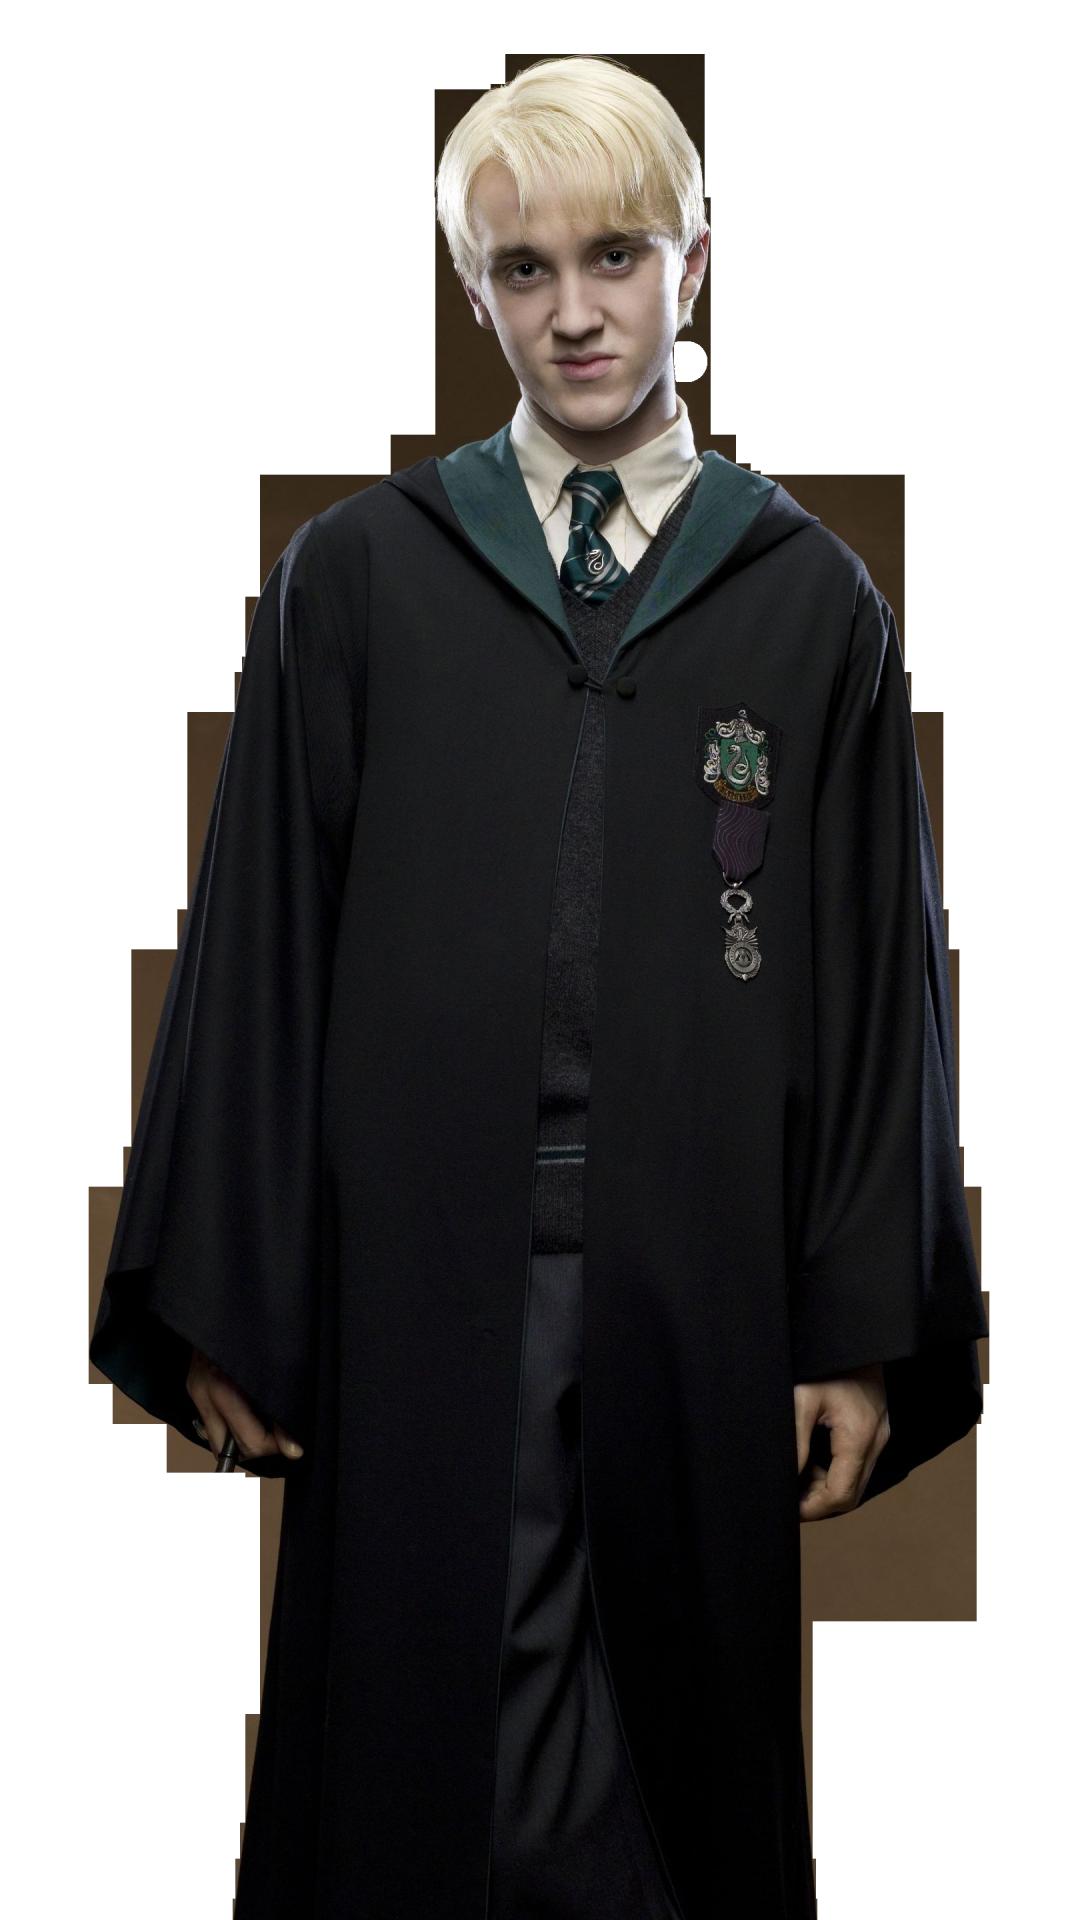 Fandomtransparents Draco Malfoy Tom Felton Draco Malfoy Malfoy